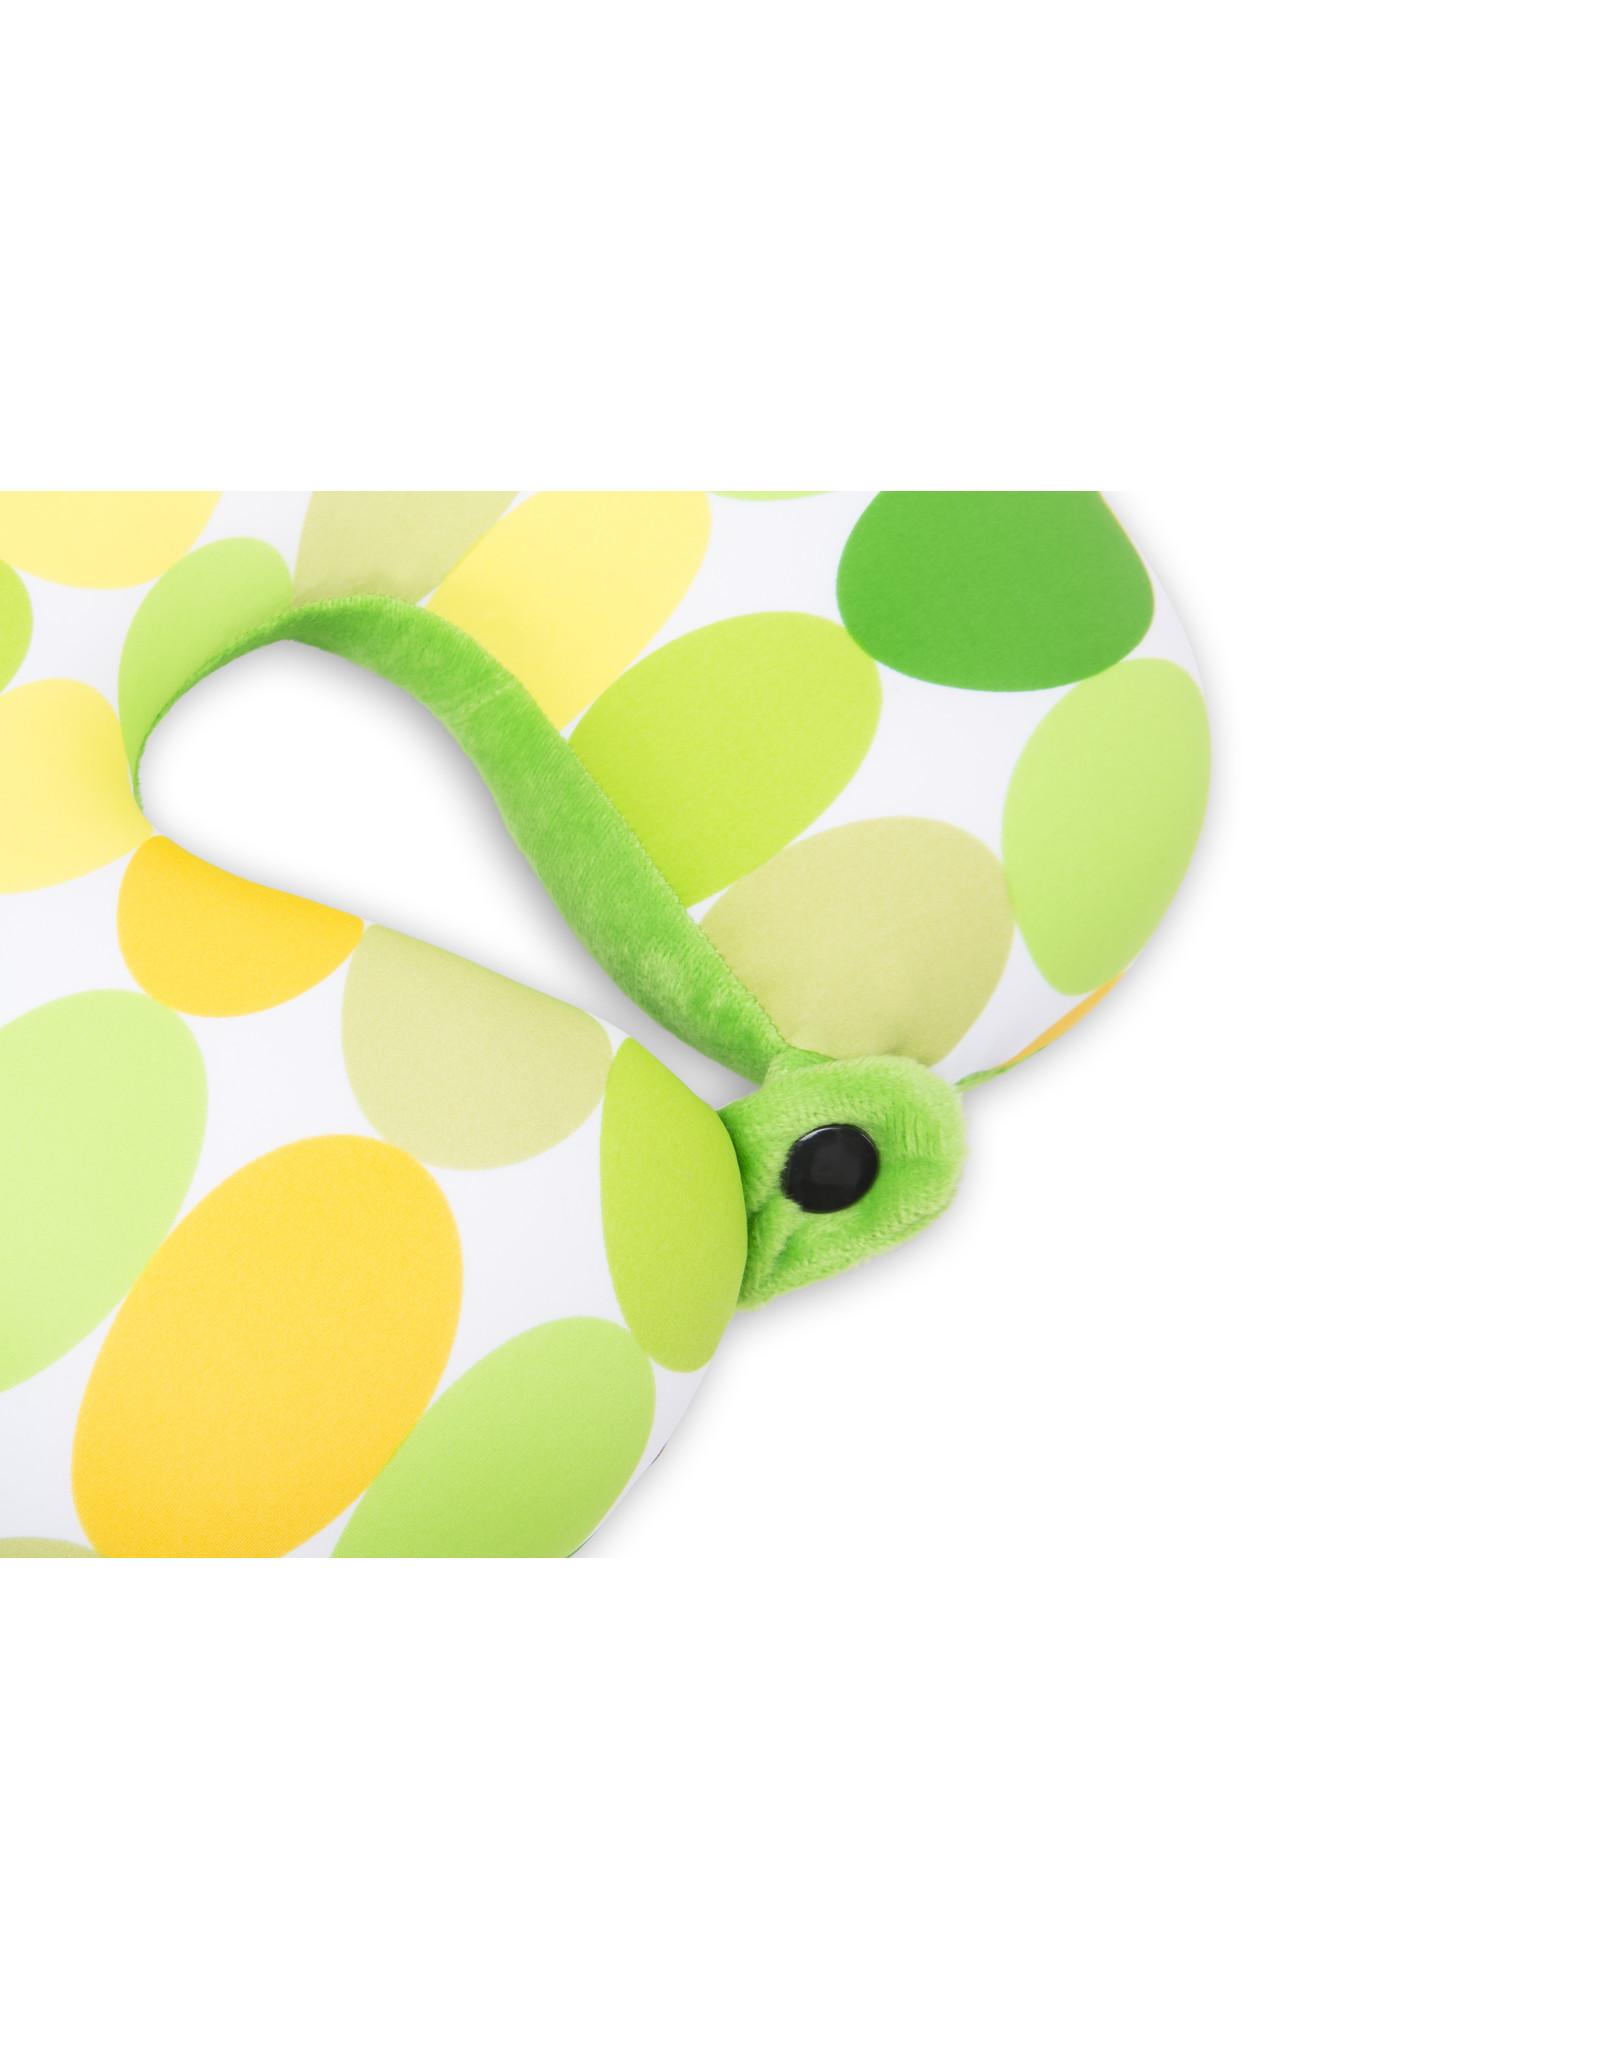 Kuschel-Maxx Kuschel-Maxx - Nack cushion Dots Yellow